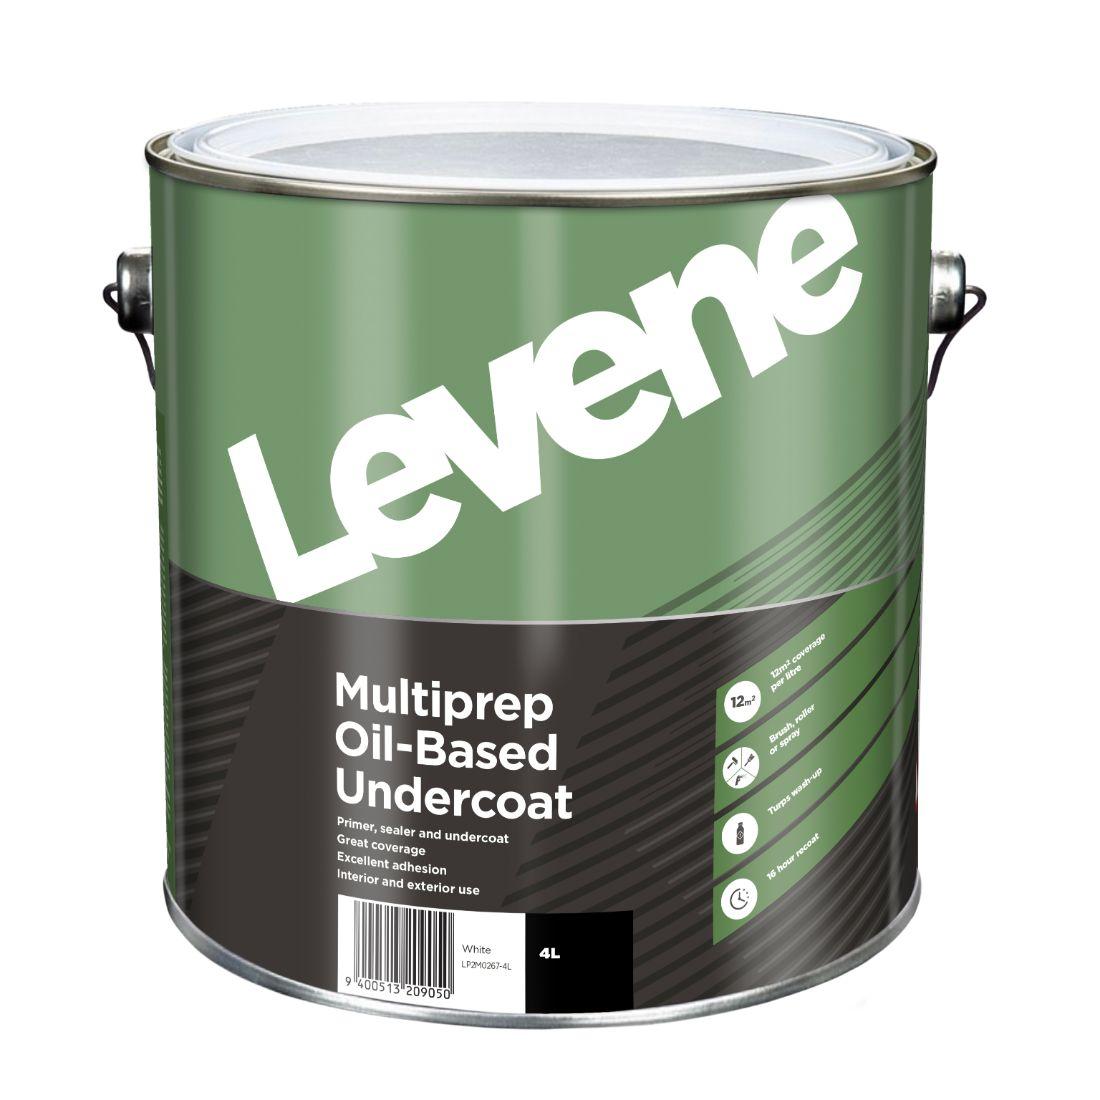 Multiprep Oil-Based Undercoat 4L